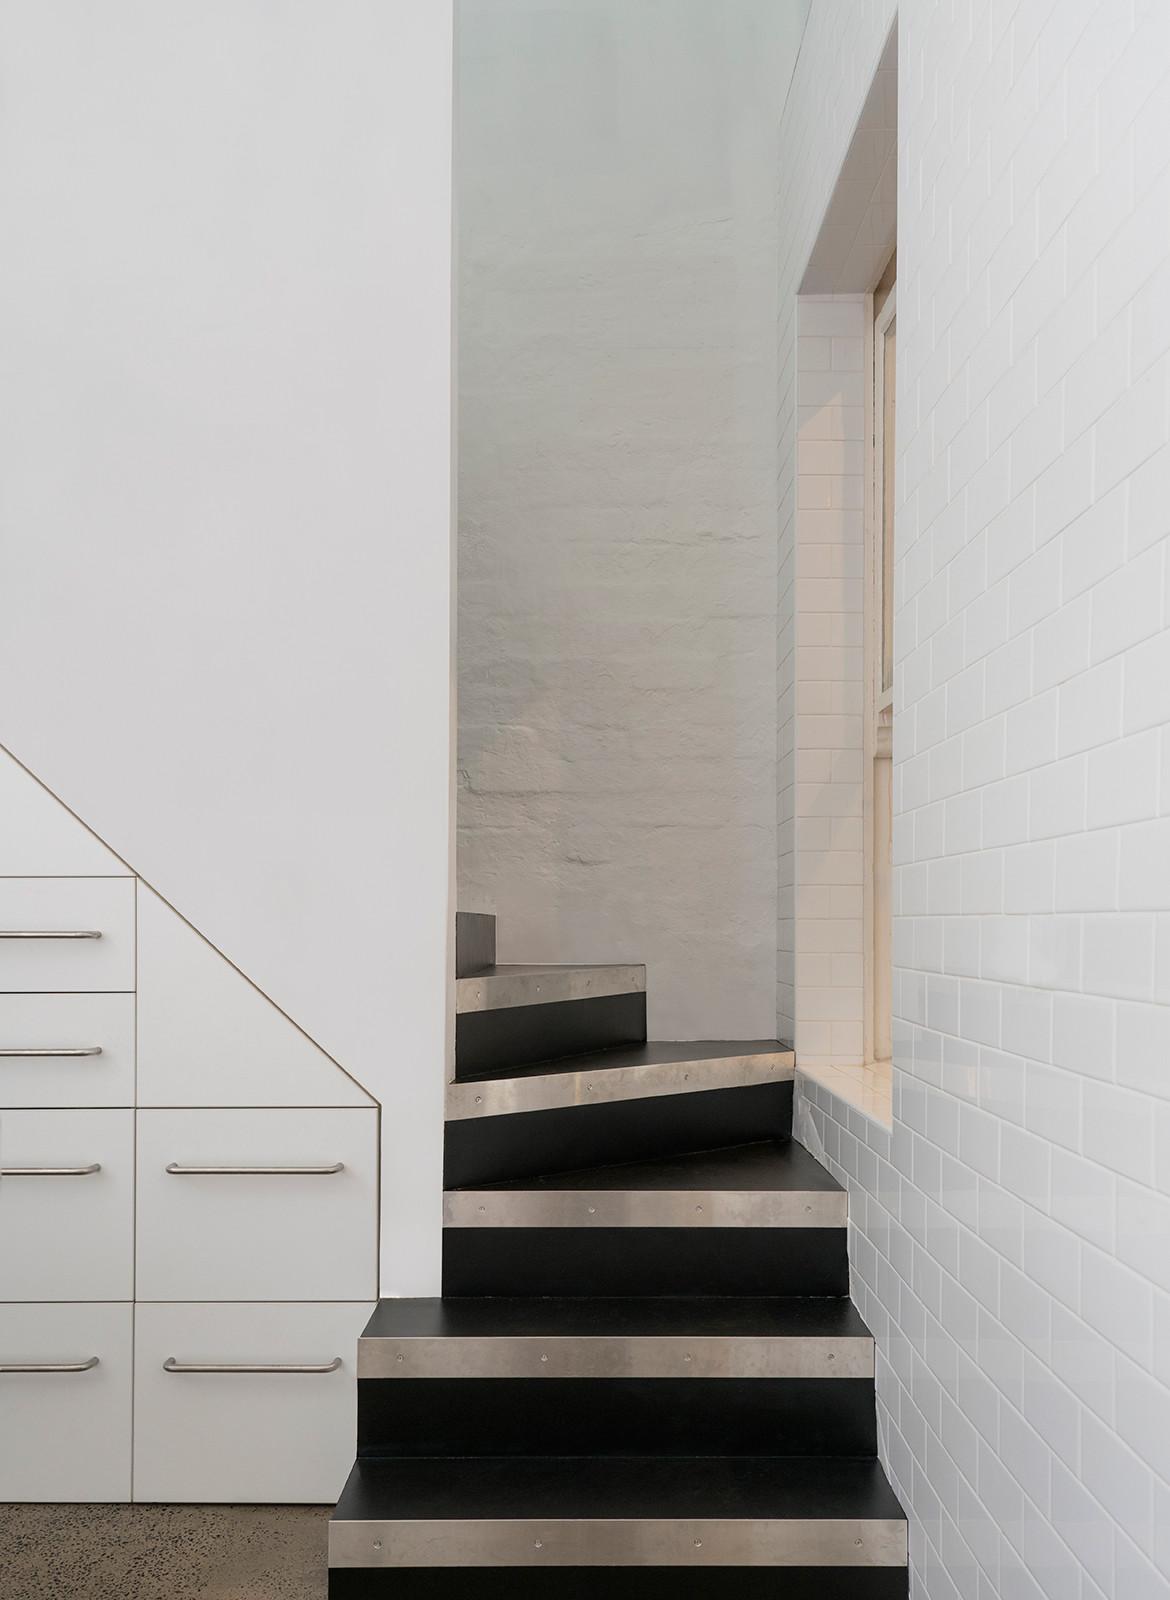 Hastings Van Nunen Ian Moore Architects CC Daniel Mayne stairs